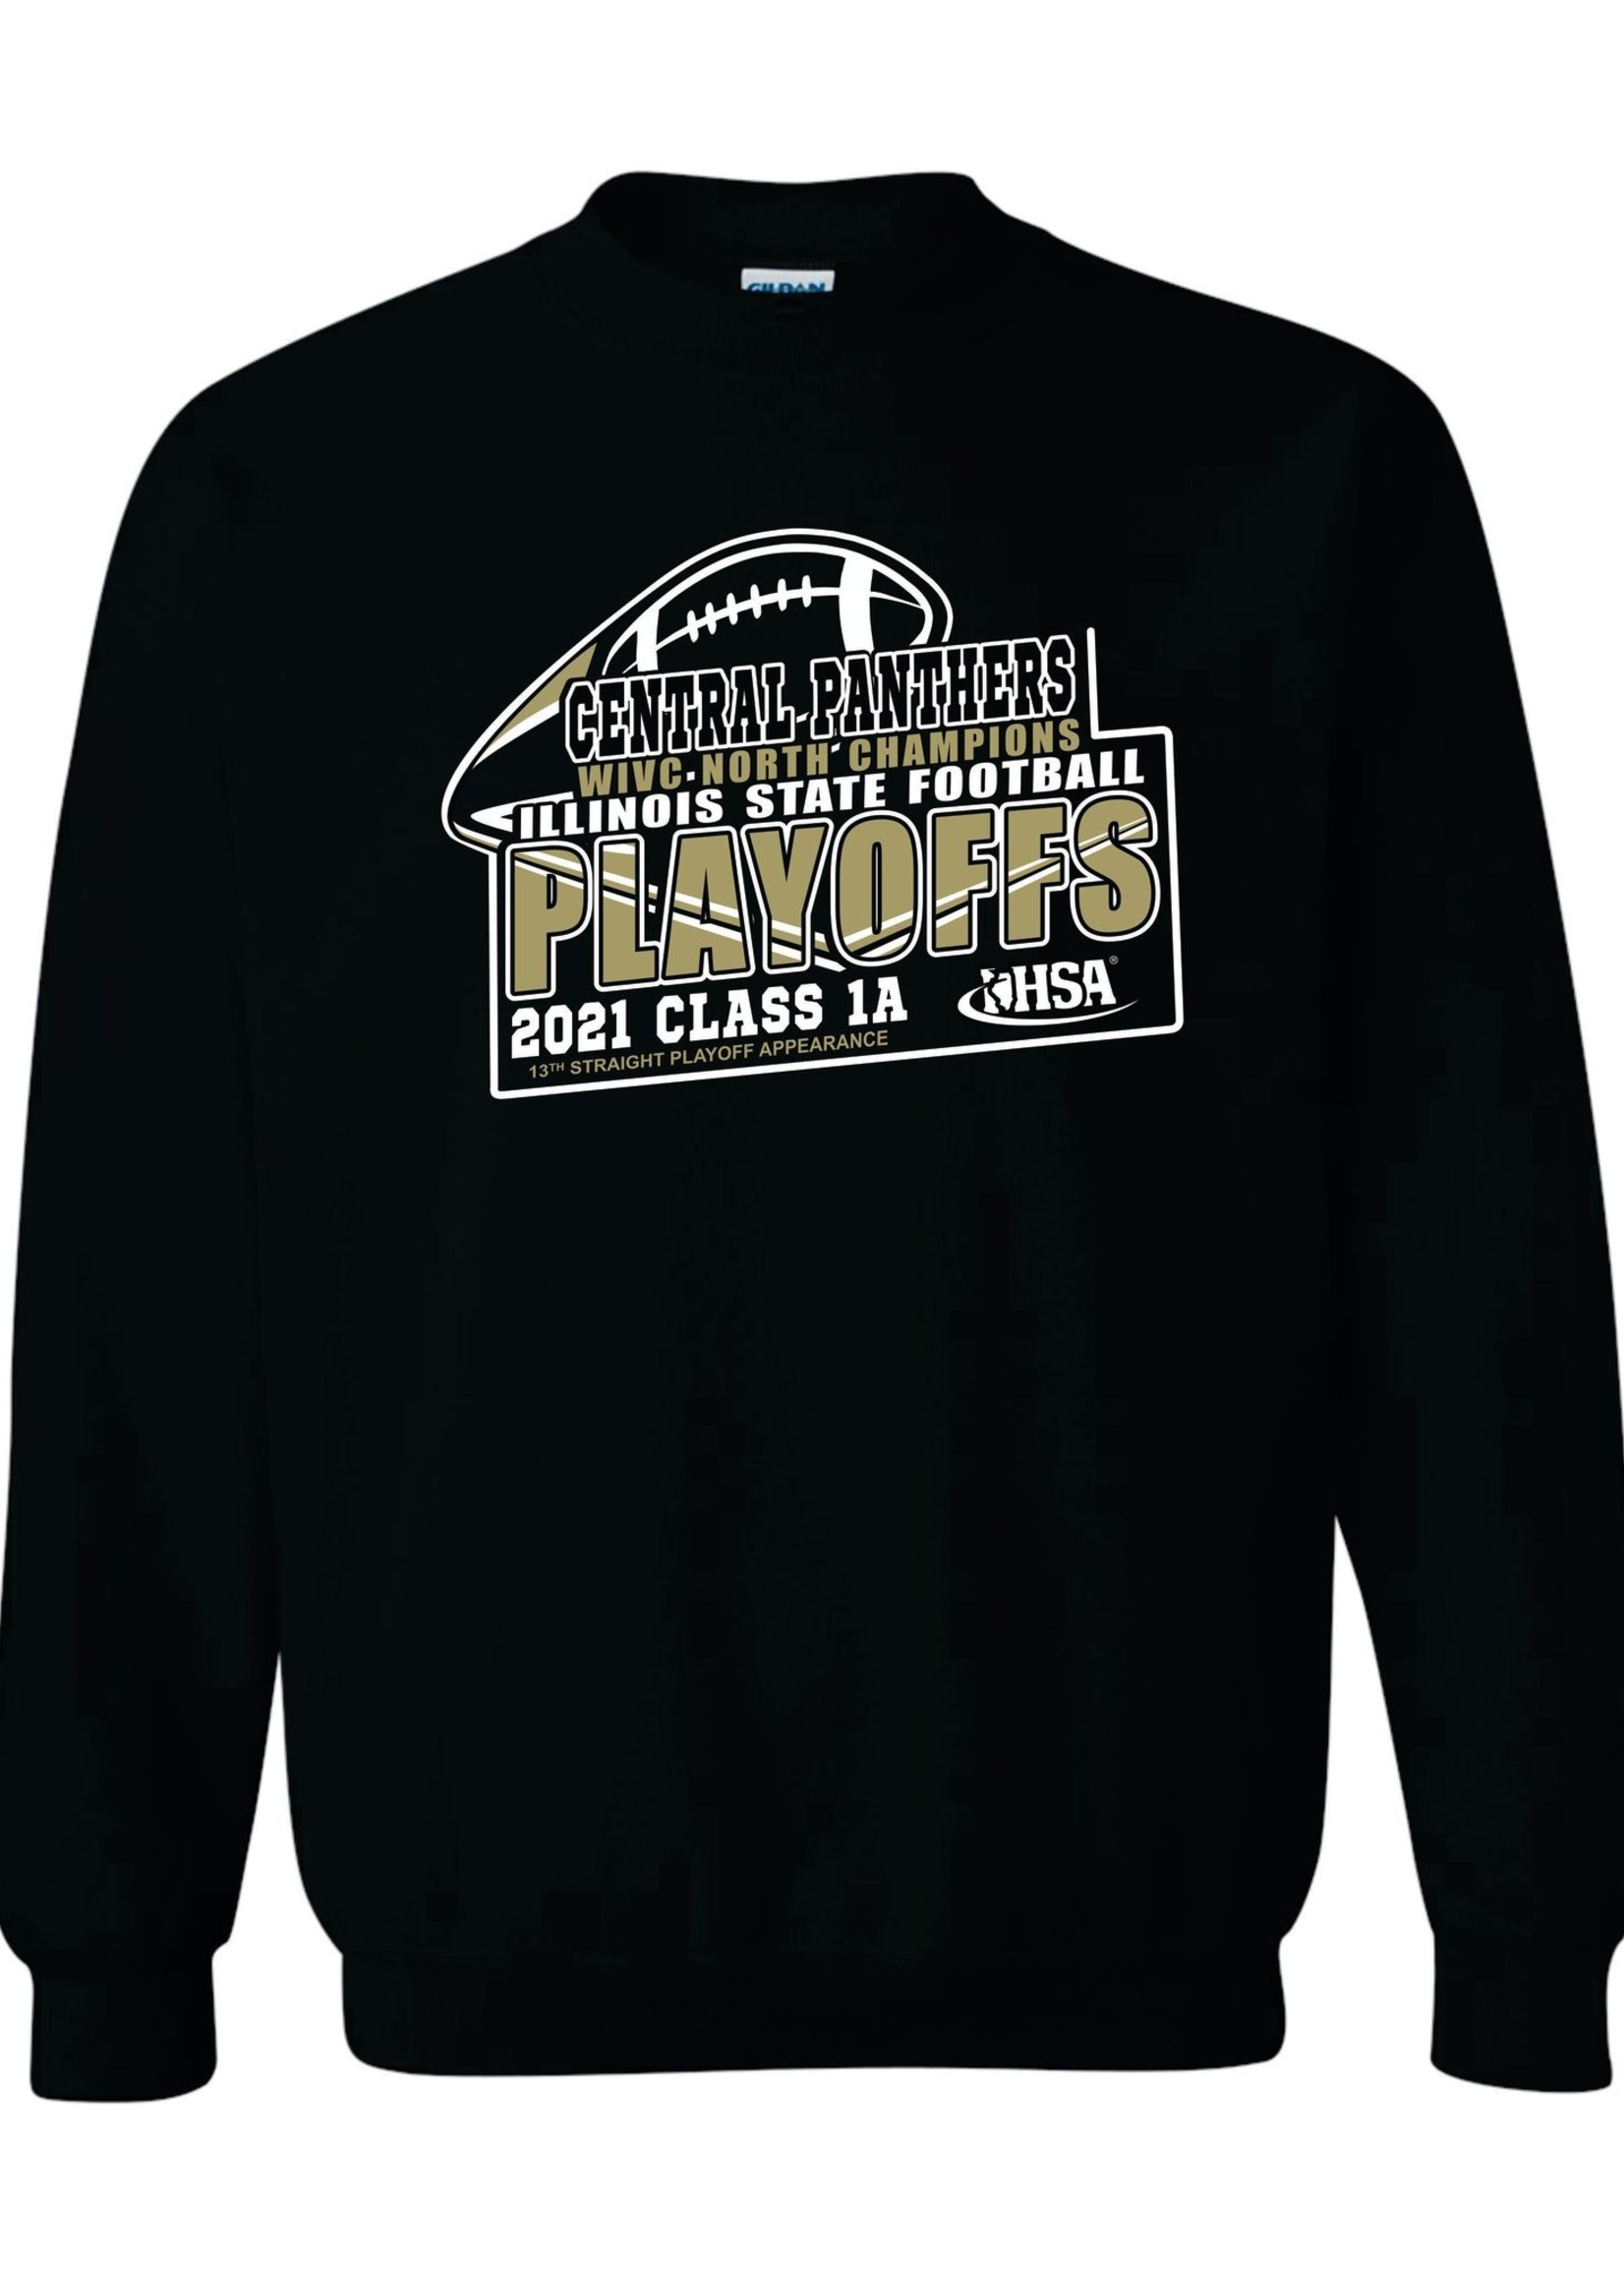 2021 Central Playoff crewneck sweatshirt